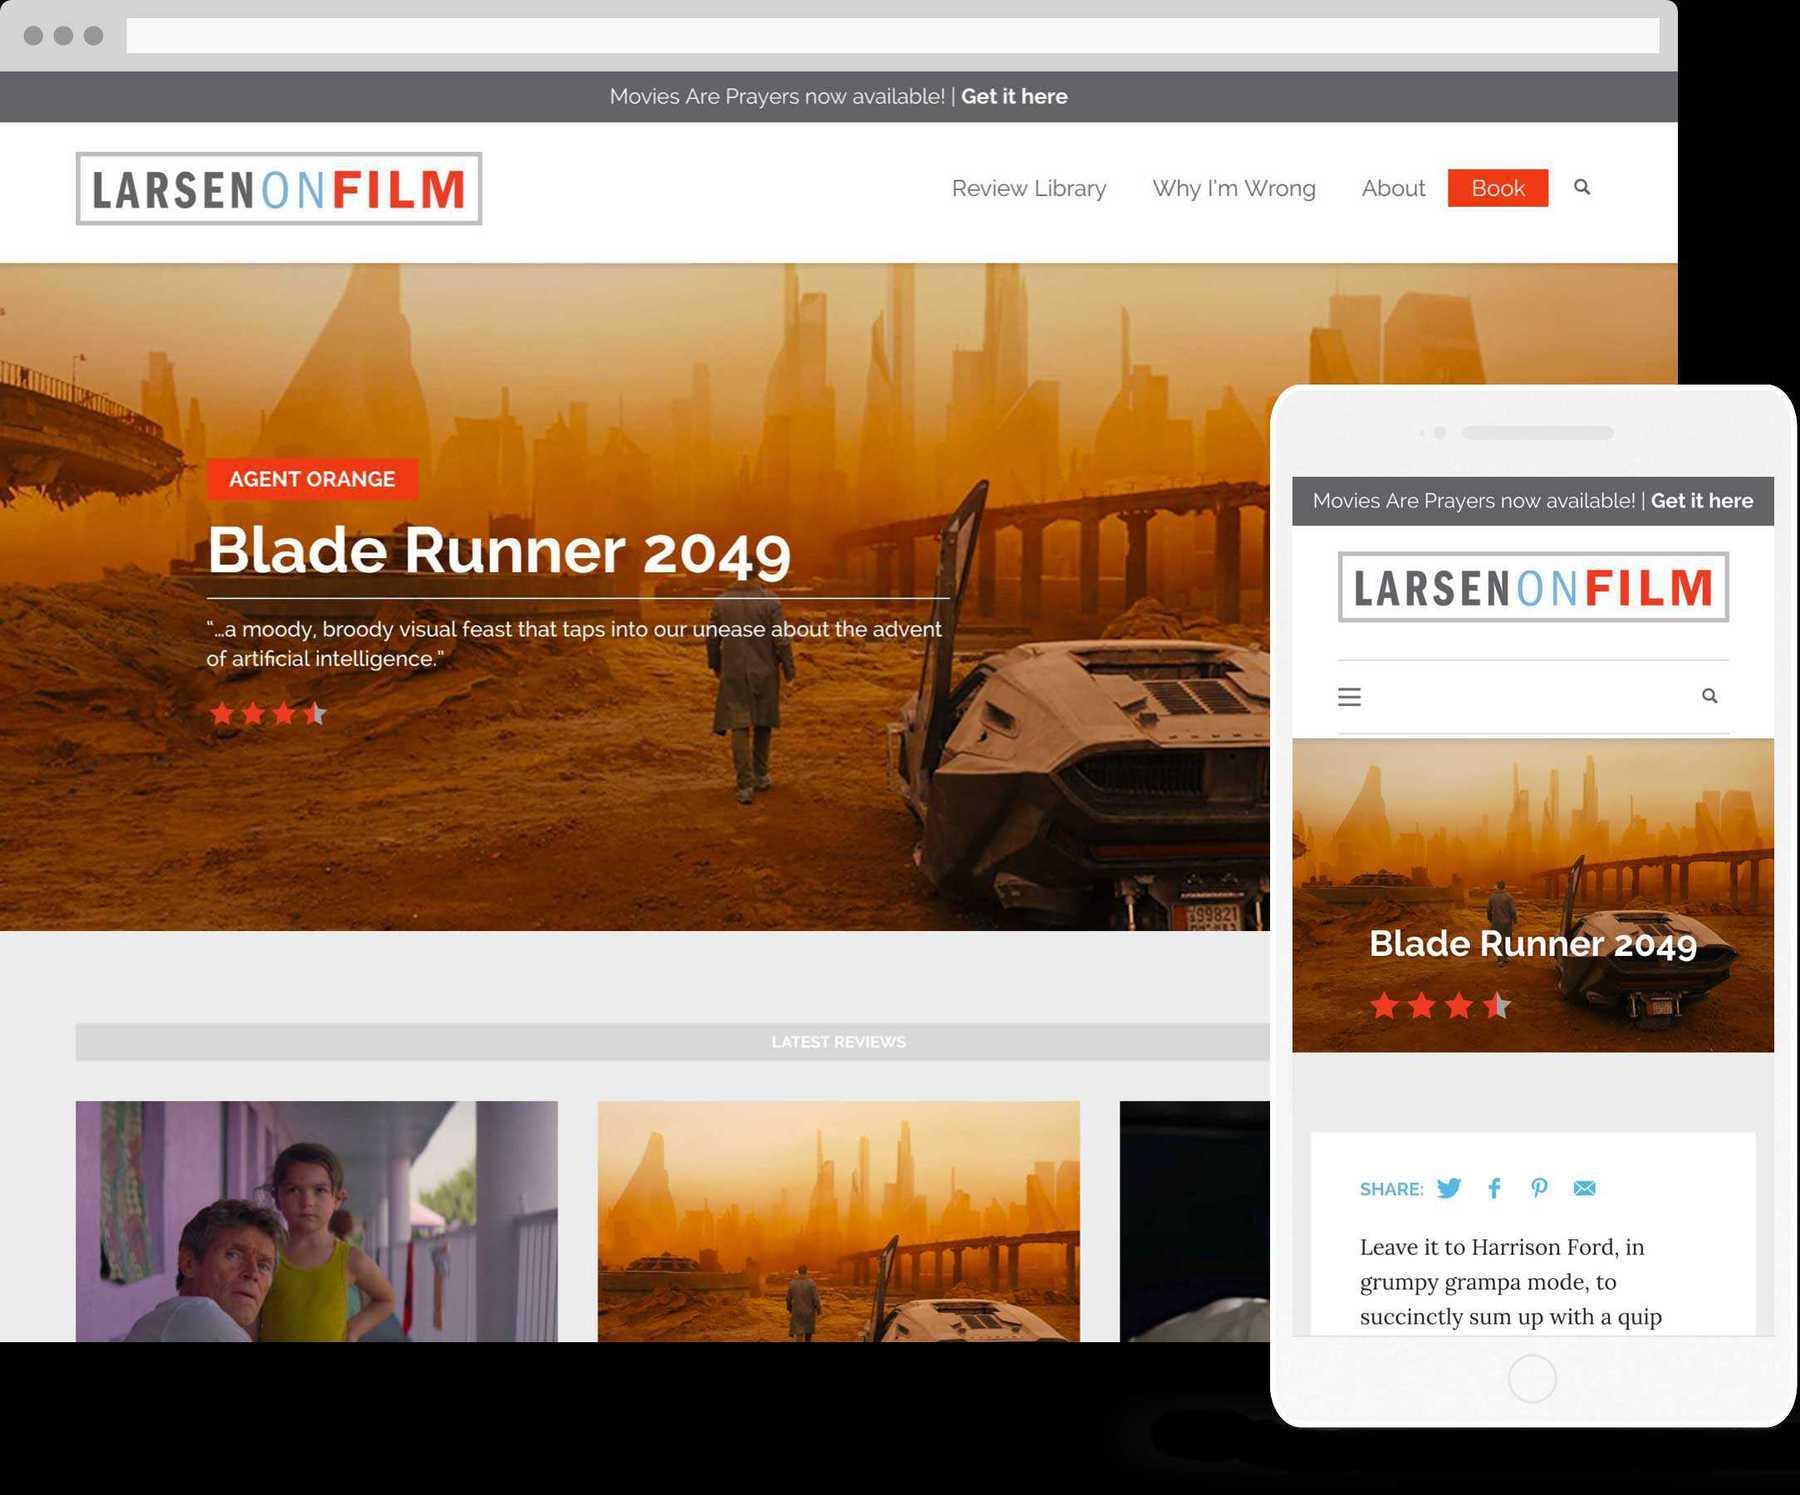 Larsen on film desktop and mobile